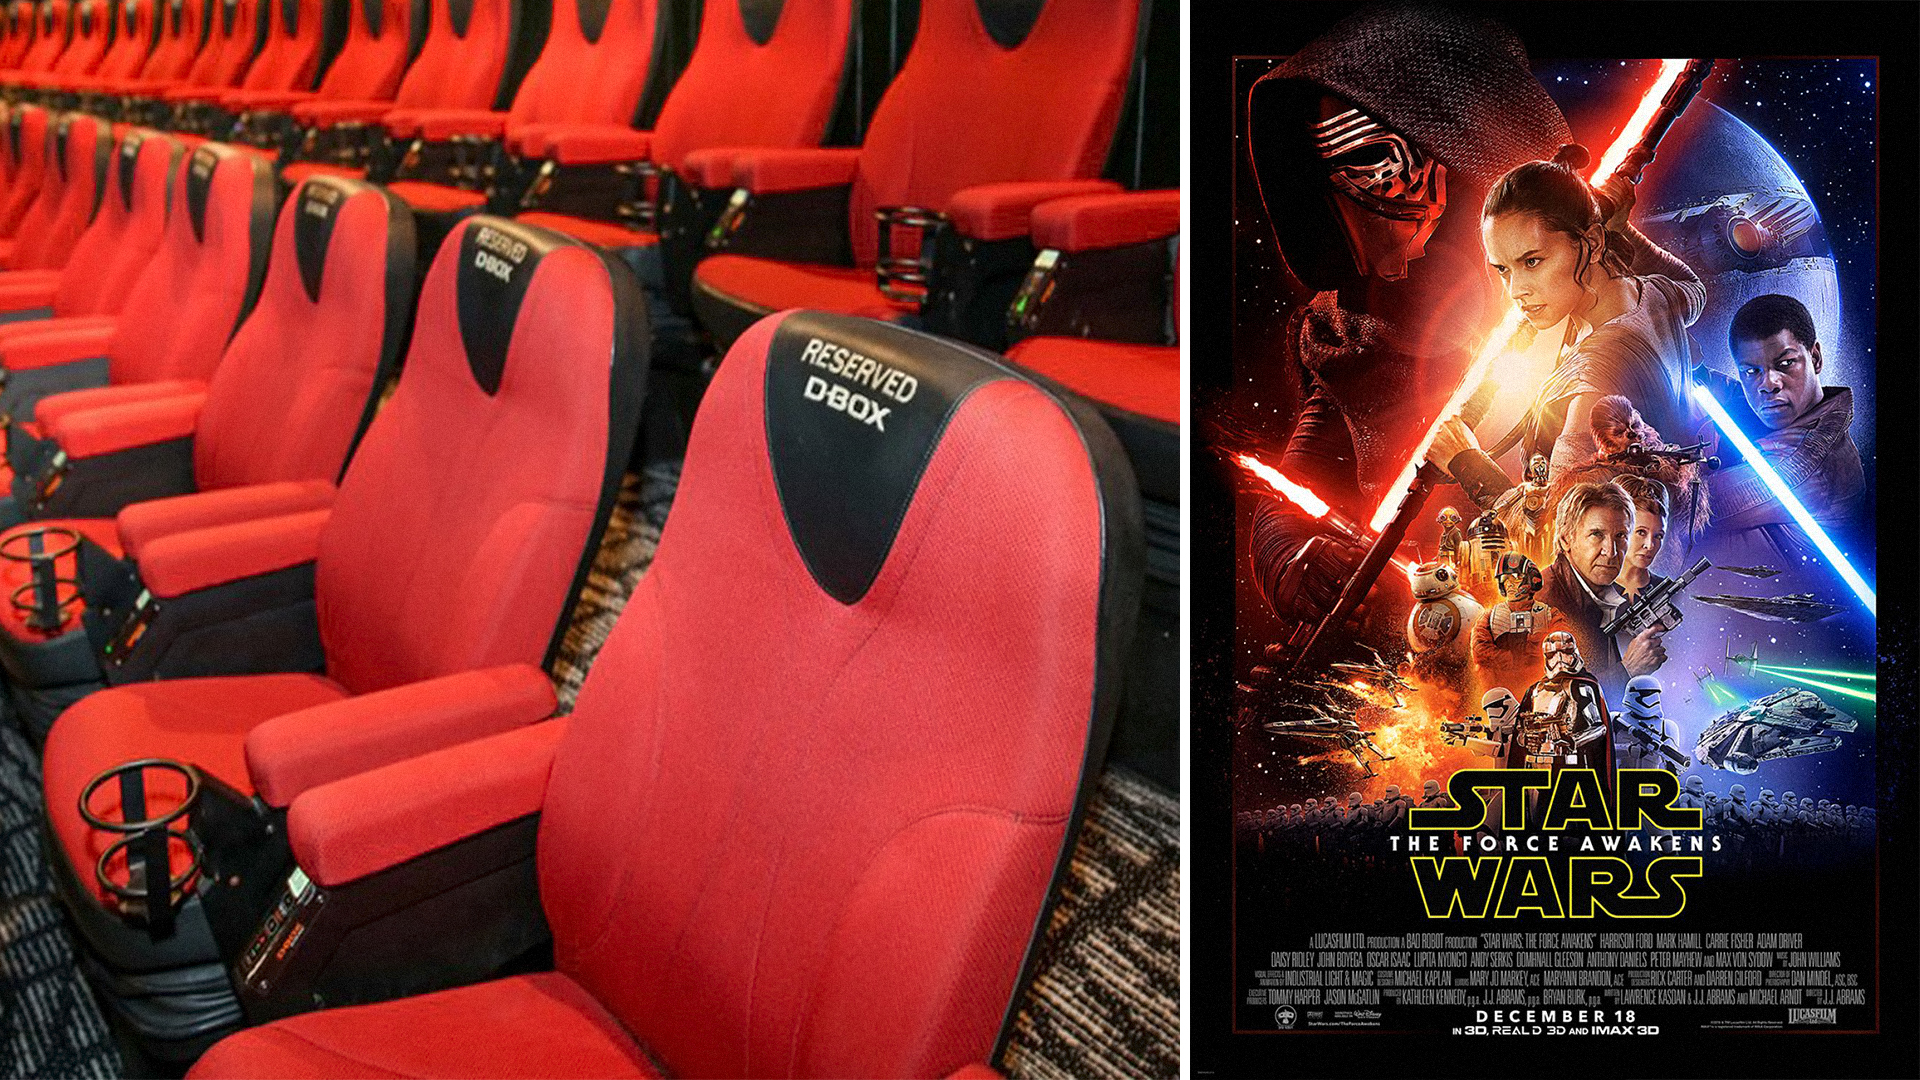 Star Wars : The Force Awaken - D-Box